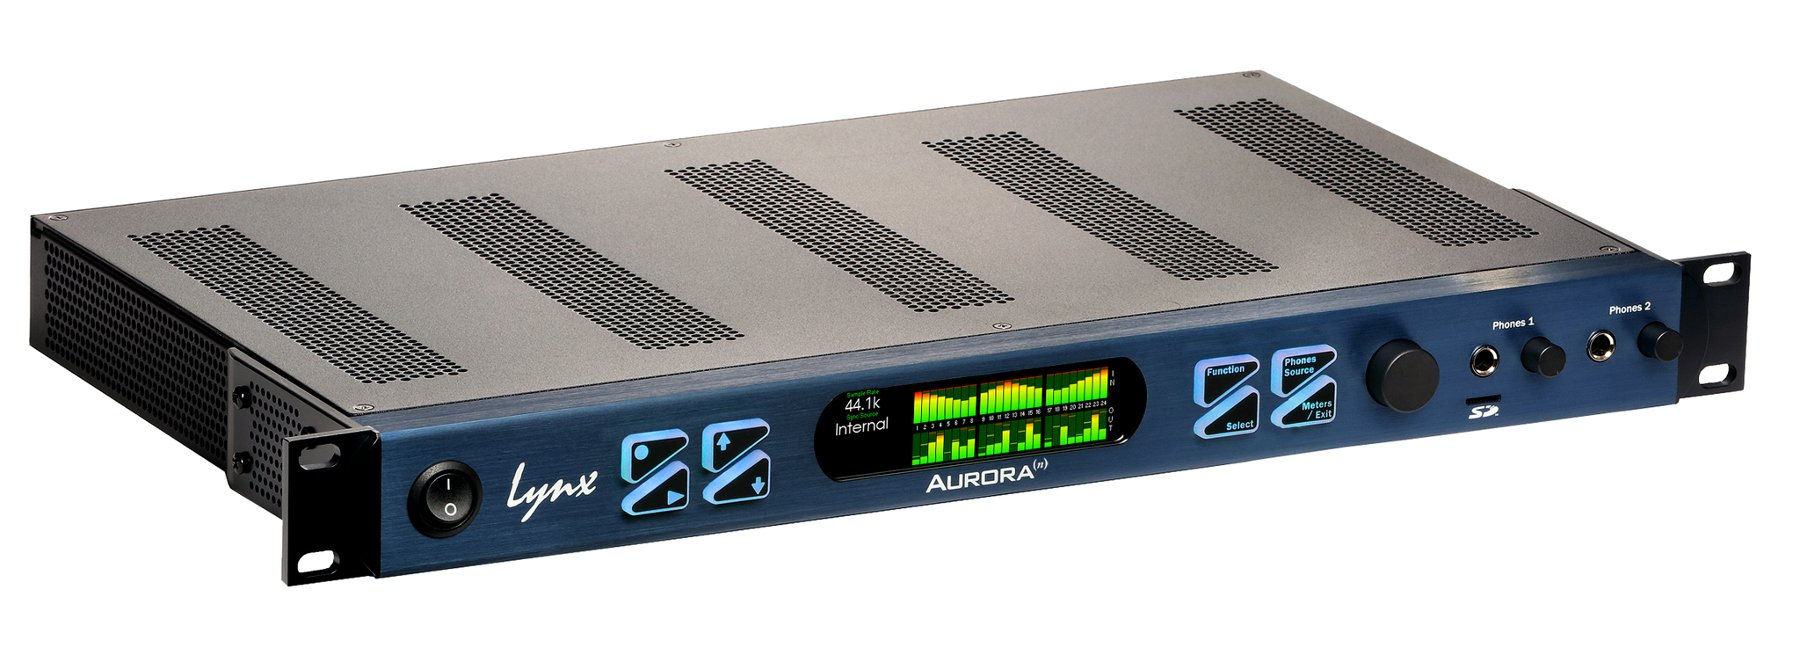 Lynx Studio Technology Aurora (n) 8 Pro Tools HD 8-channel 24-bit / 192 kHz A/D D/A Converter System [Pro Tools HD] AURORA-N-8-HD